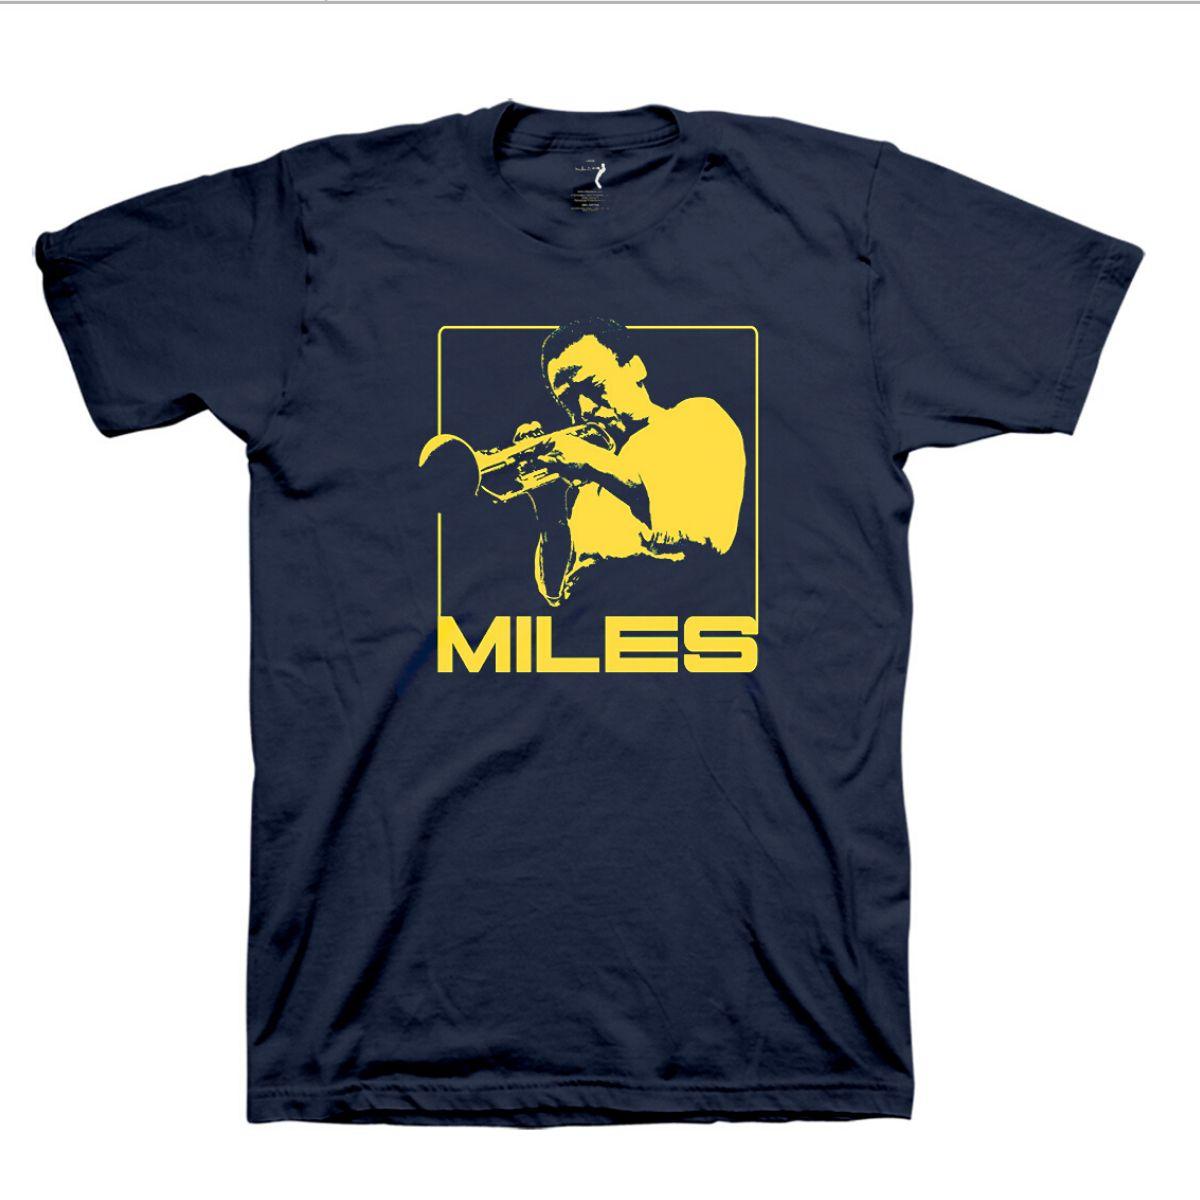 Miles In Mono T-Shirt: Yellow